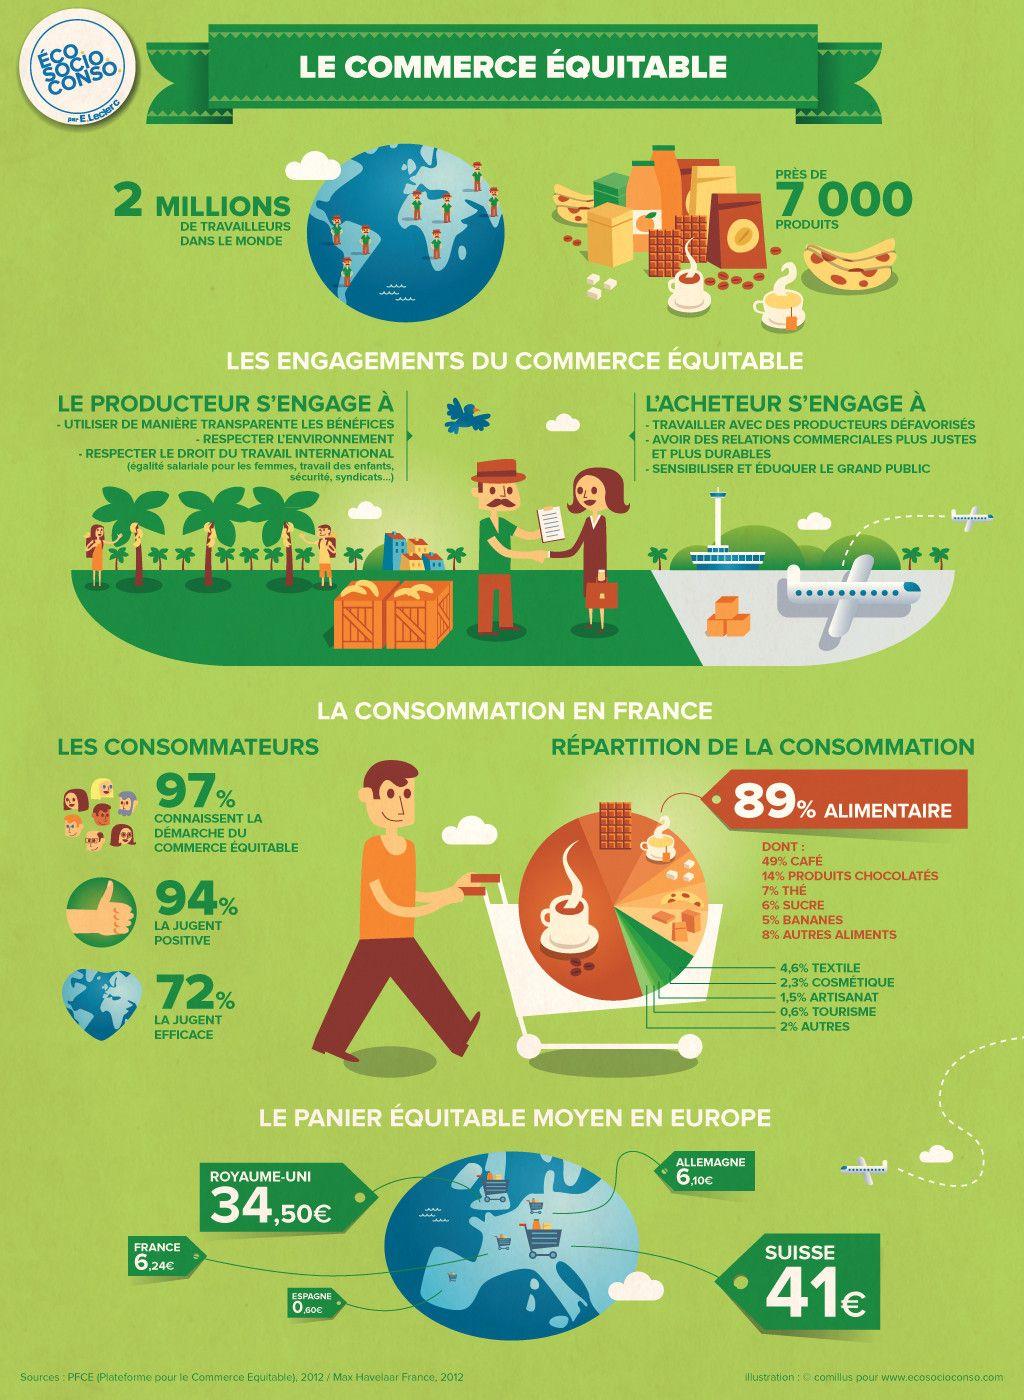 commerce équitable | Fair trade, Marketing, Education